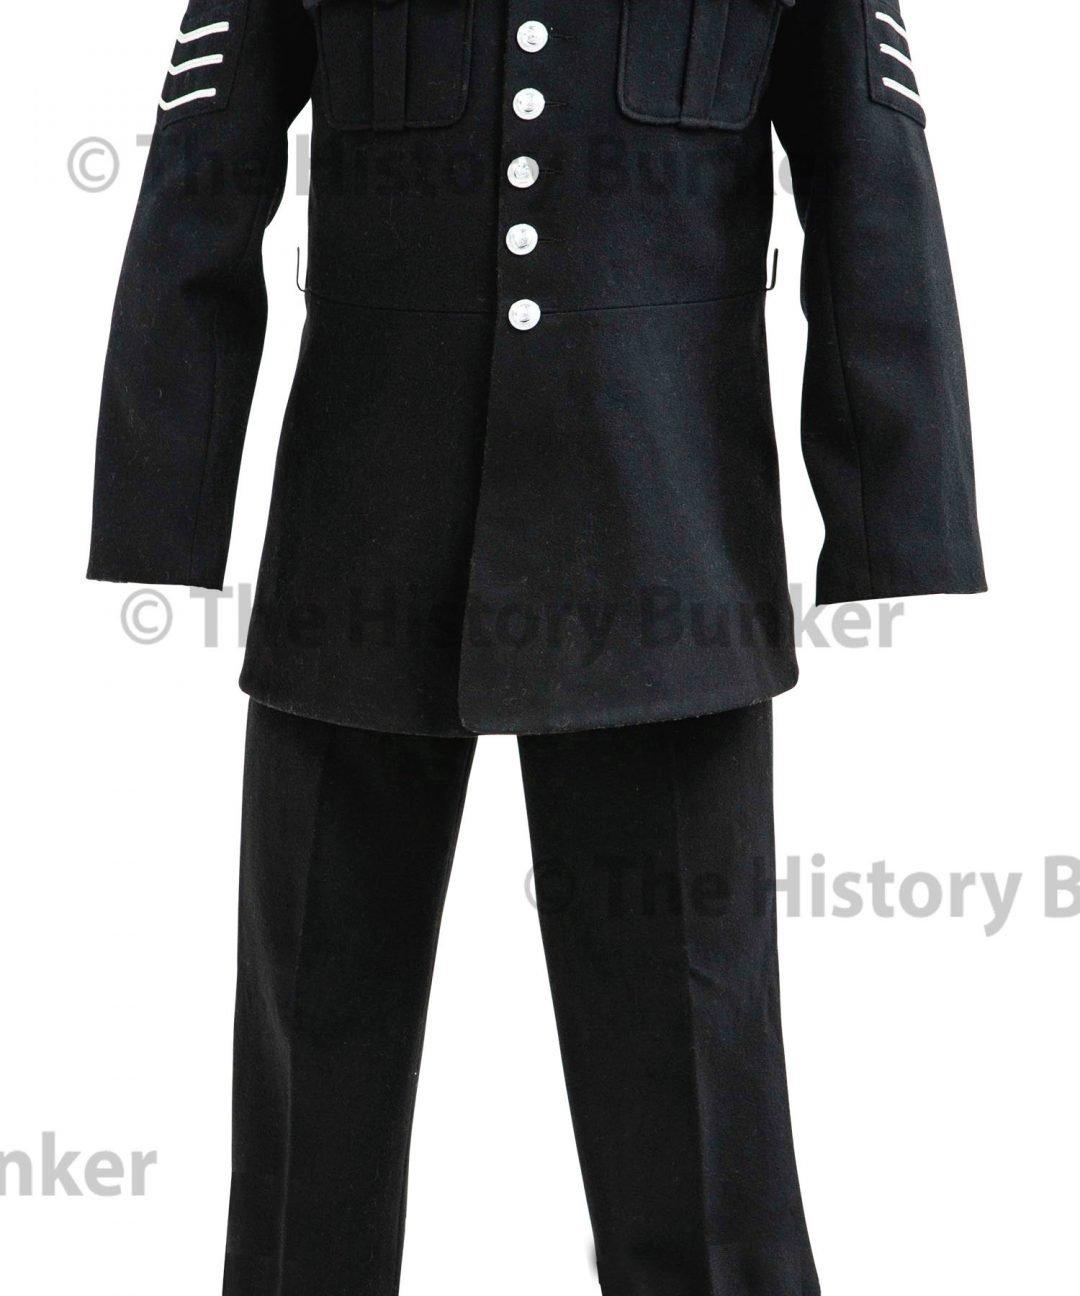 British Edwardian police uniform circa 1918